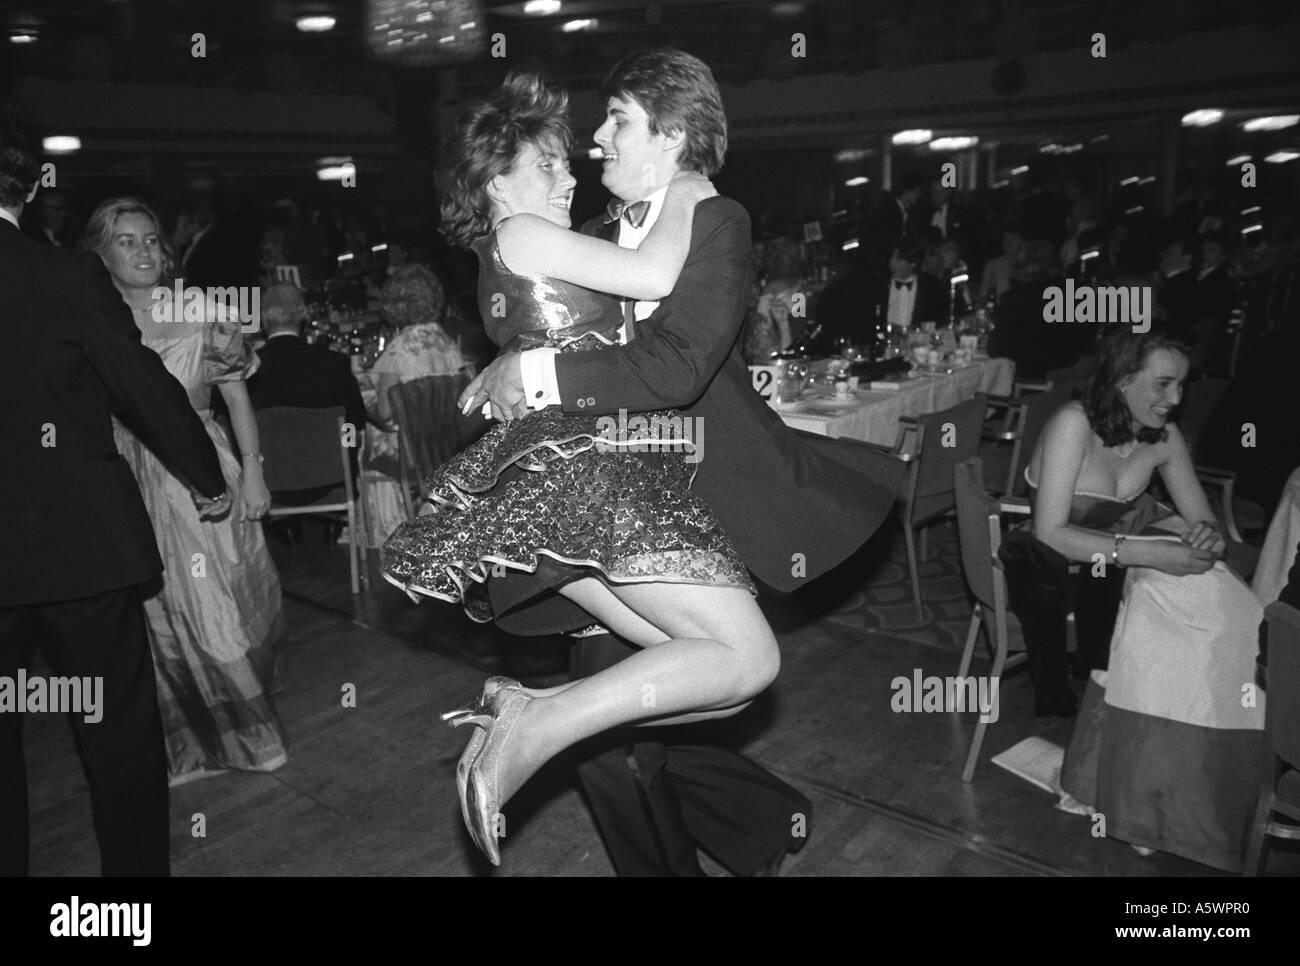 Sloan Ranger tipos en el Baile de la rosa anual Grosvenor House Hotel Londres Inglaterra 1982 Imagen De Stock